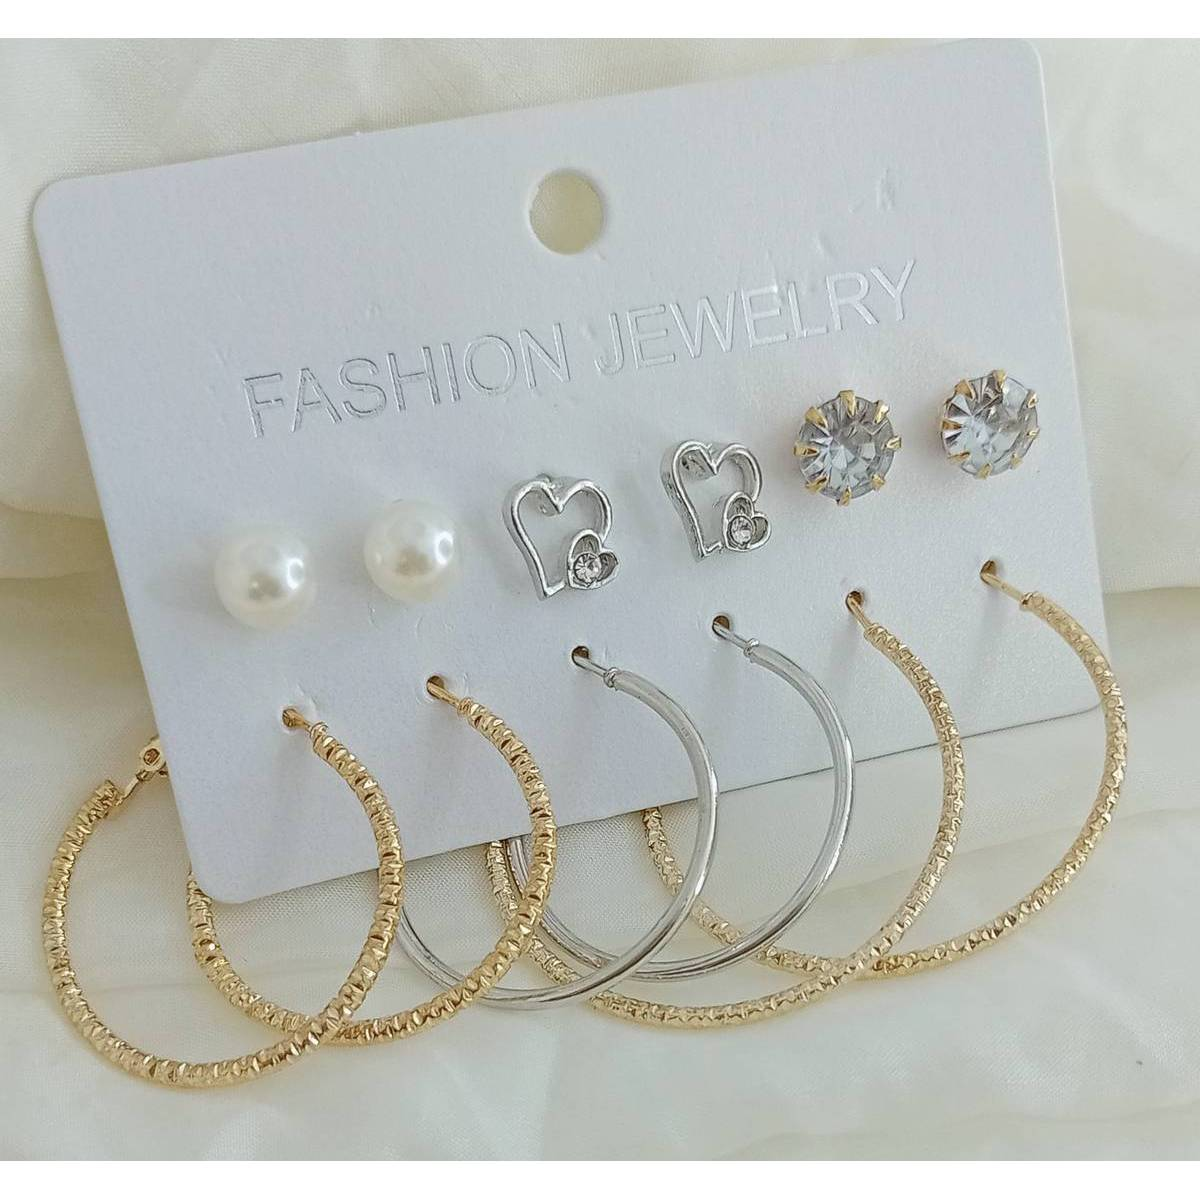 Fashionable 6 pairs/sets Hoop Earring Stud Earring Fashion For Women Girl Jewelry Earring ( 3 Bali & 3 Tops )